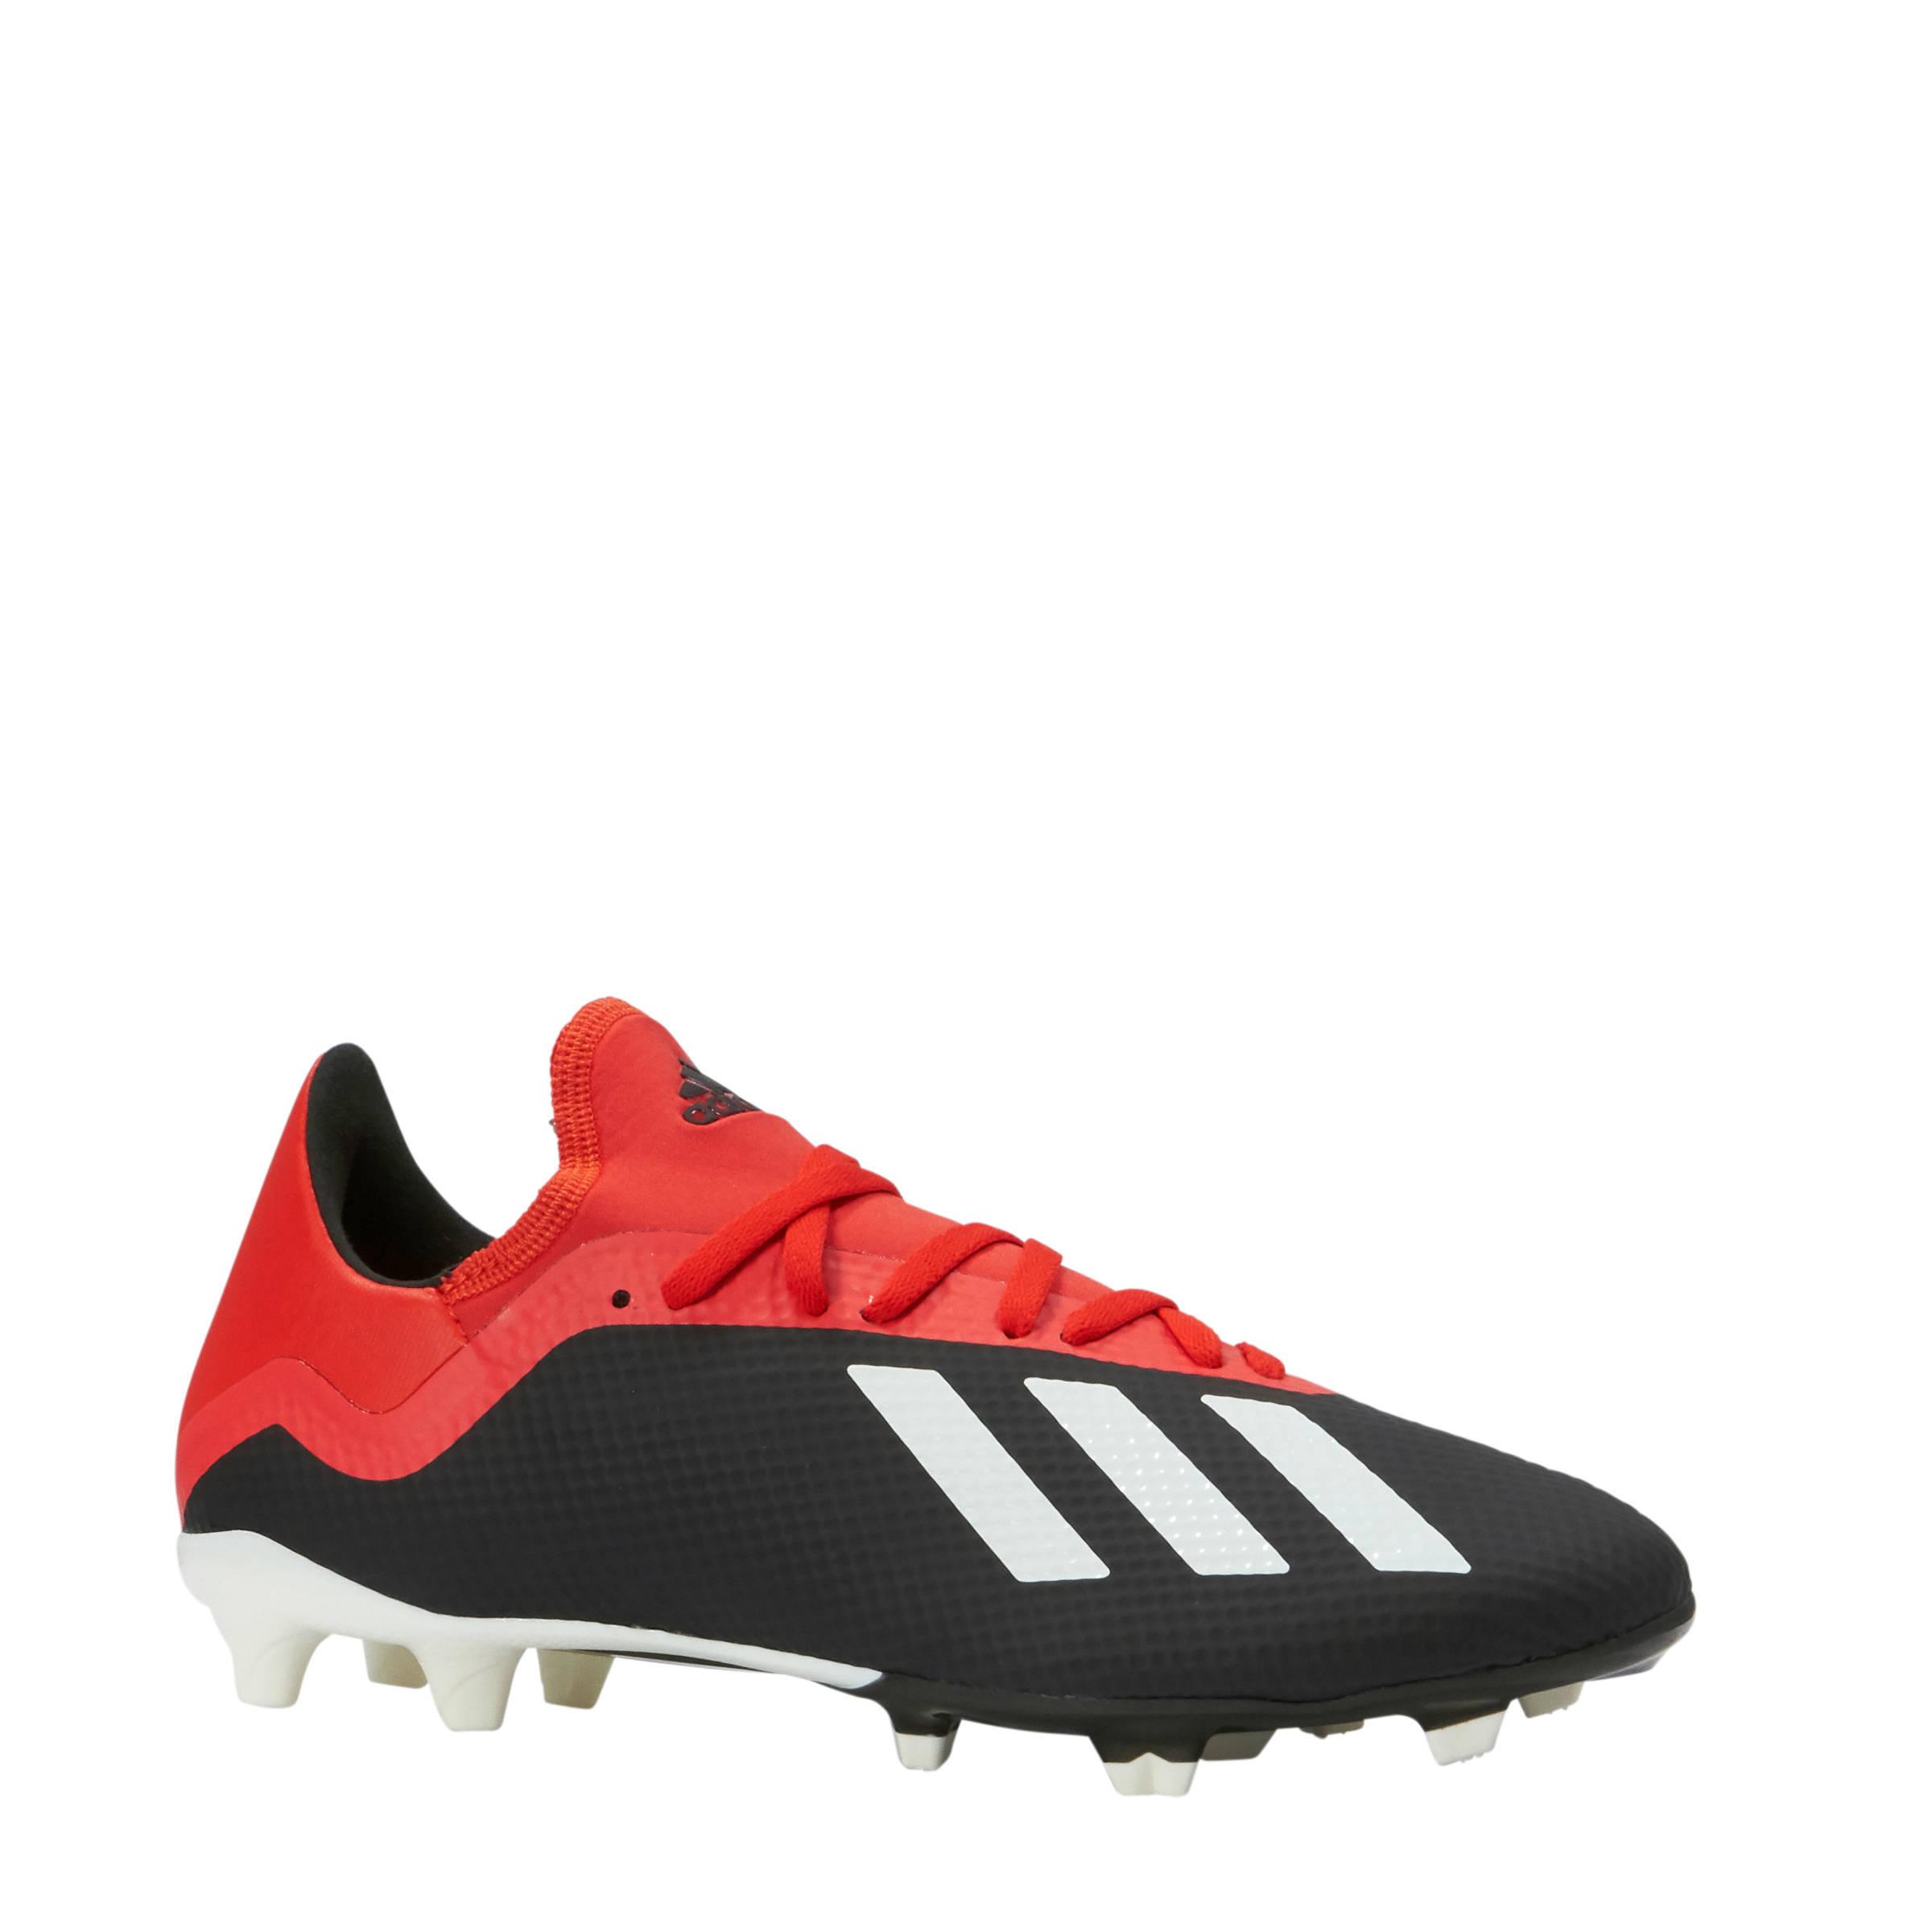 voetbalschoenen adidas outlet